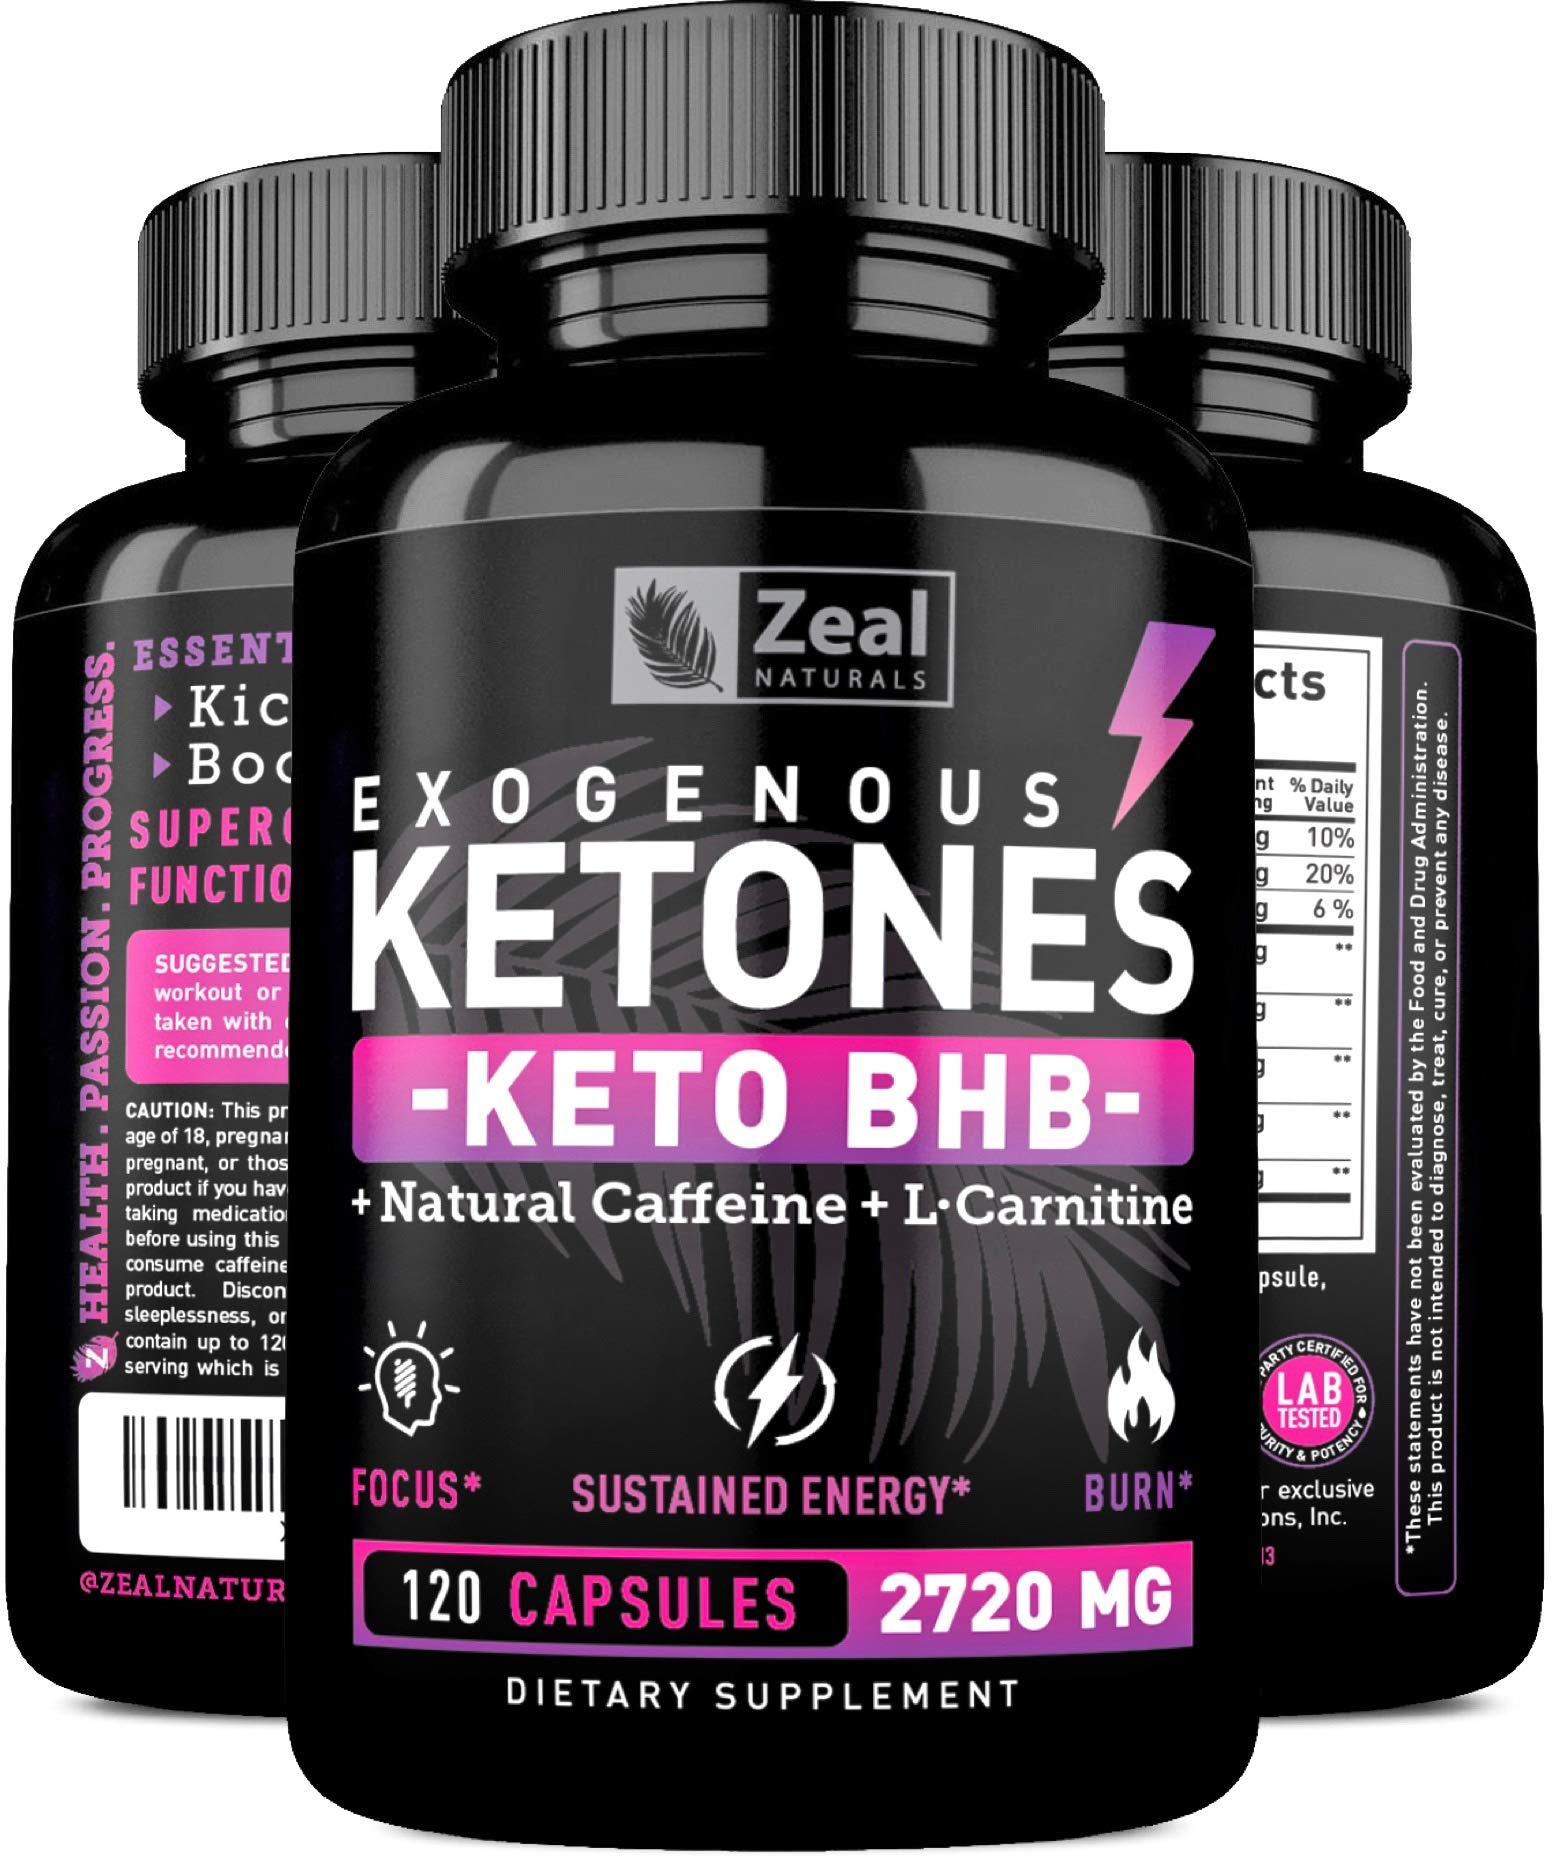 Keto BHB Exogenous Ketones Pills (2720mg | 120 Capsules) Keto Pills w. goBHB Salts, Natural Caffeine & L-Carnitine - Keto BHB Oil Capsules Beta Hydroxybutyrate for Weight Loss Keto Vitamins Keto Salts by Zeal Naturals (Image #1)